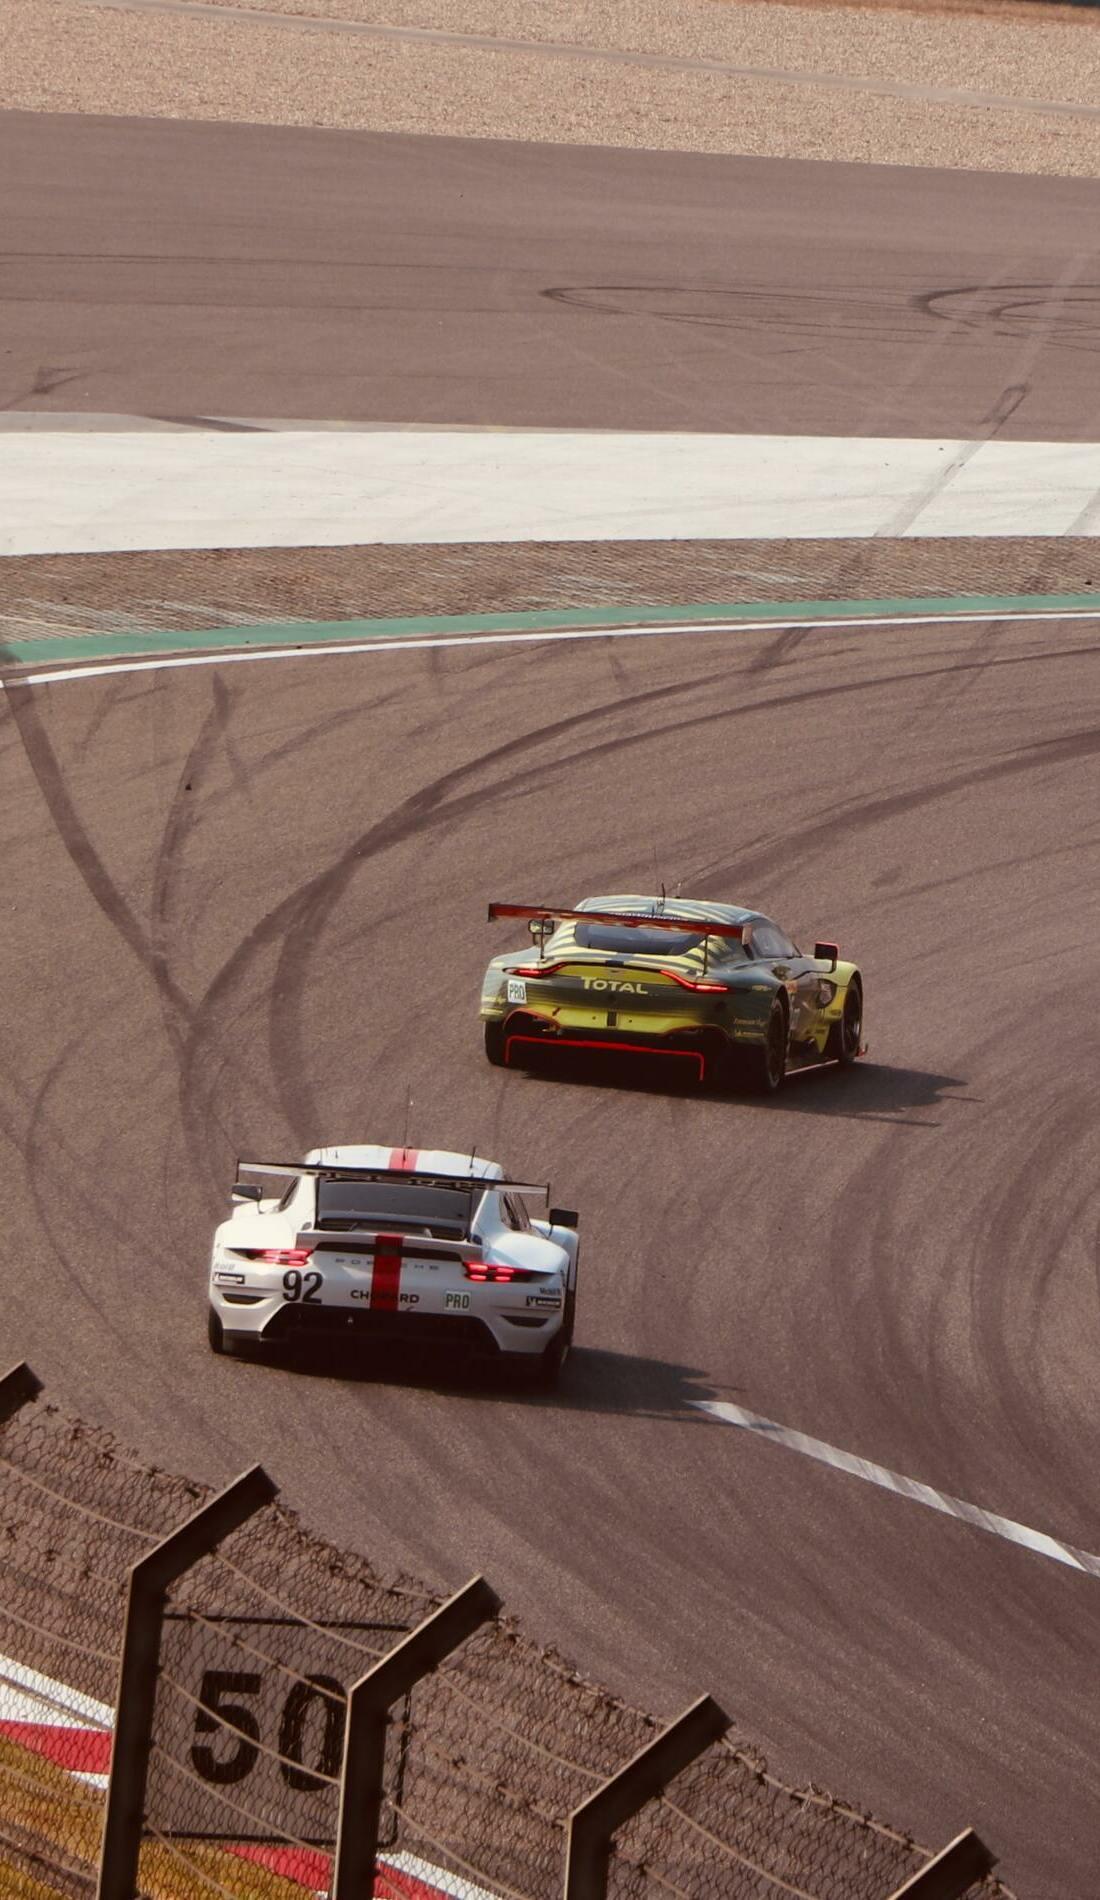 A Toyota Grand Prix of Long Beach live event